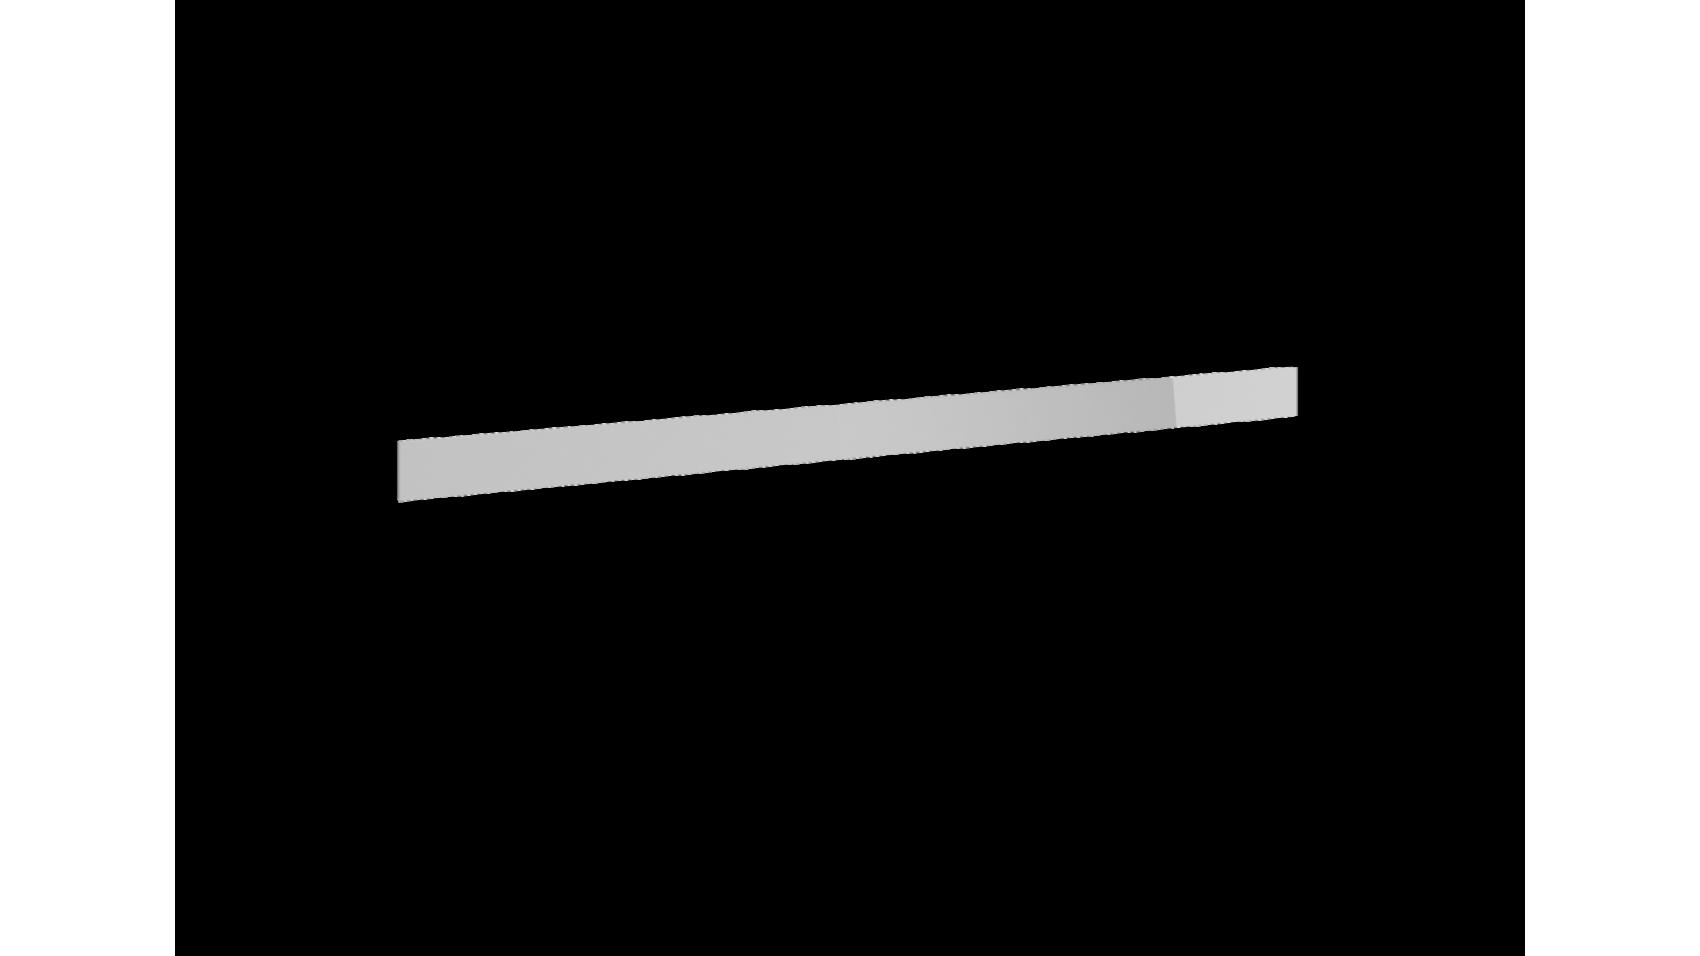 Kuchenne Elementy Dodatkowe Vegas Light Grey | sklep internetowy Lupus ECO